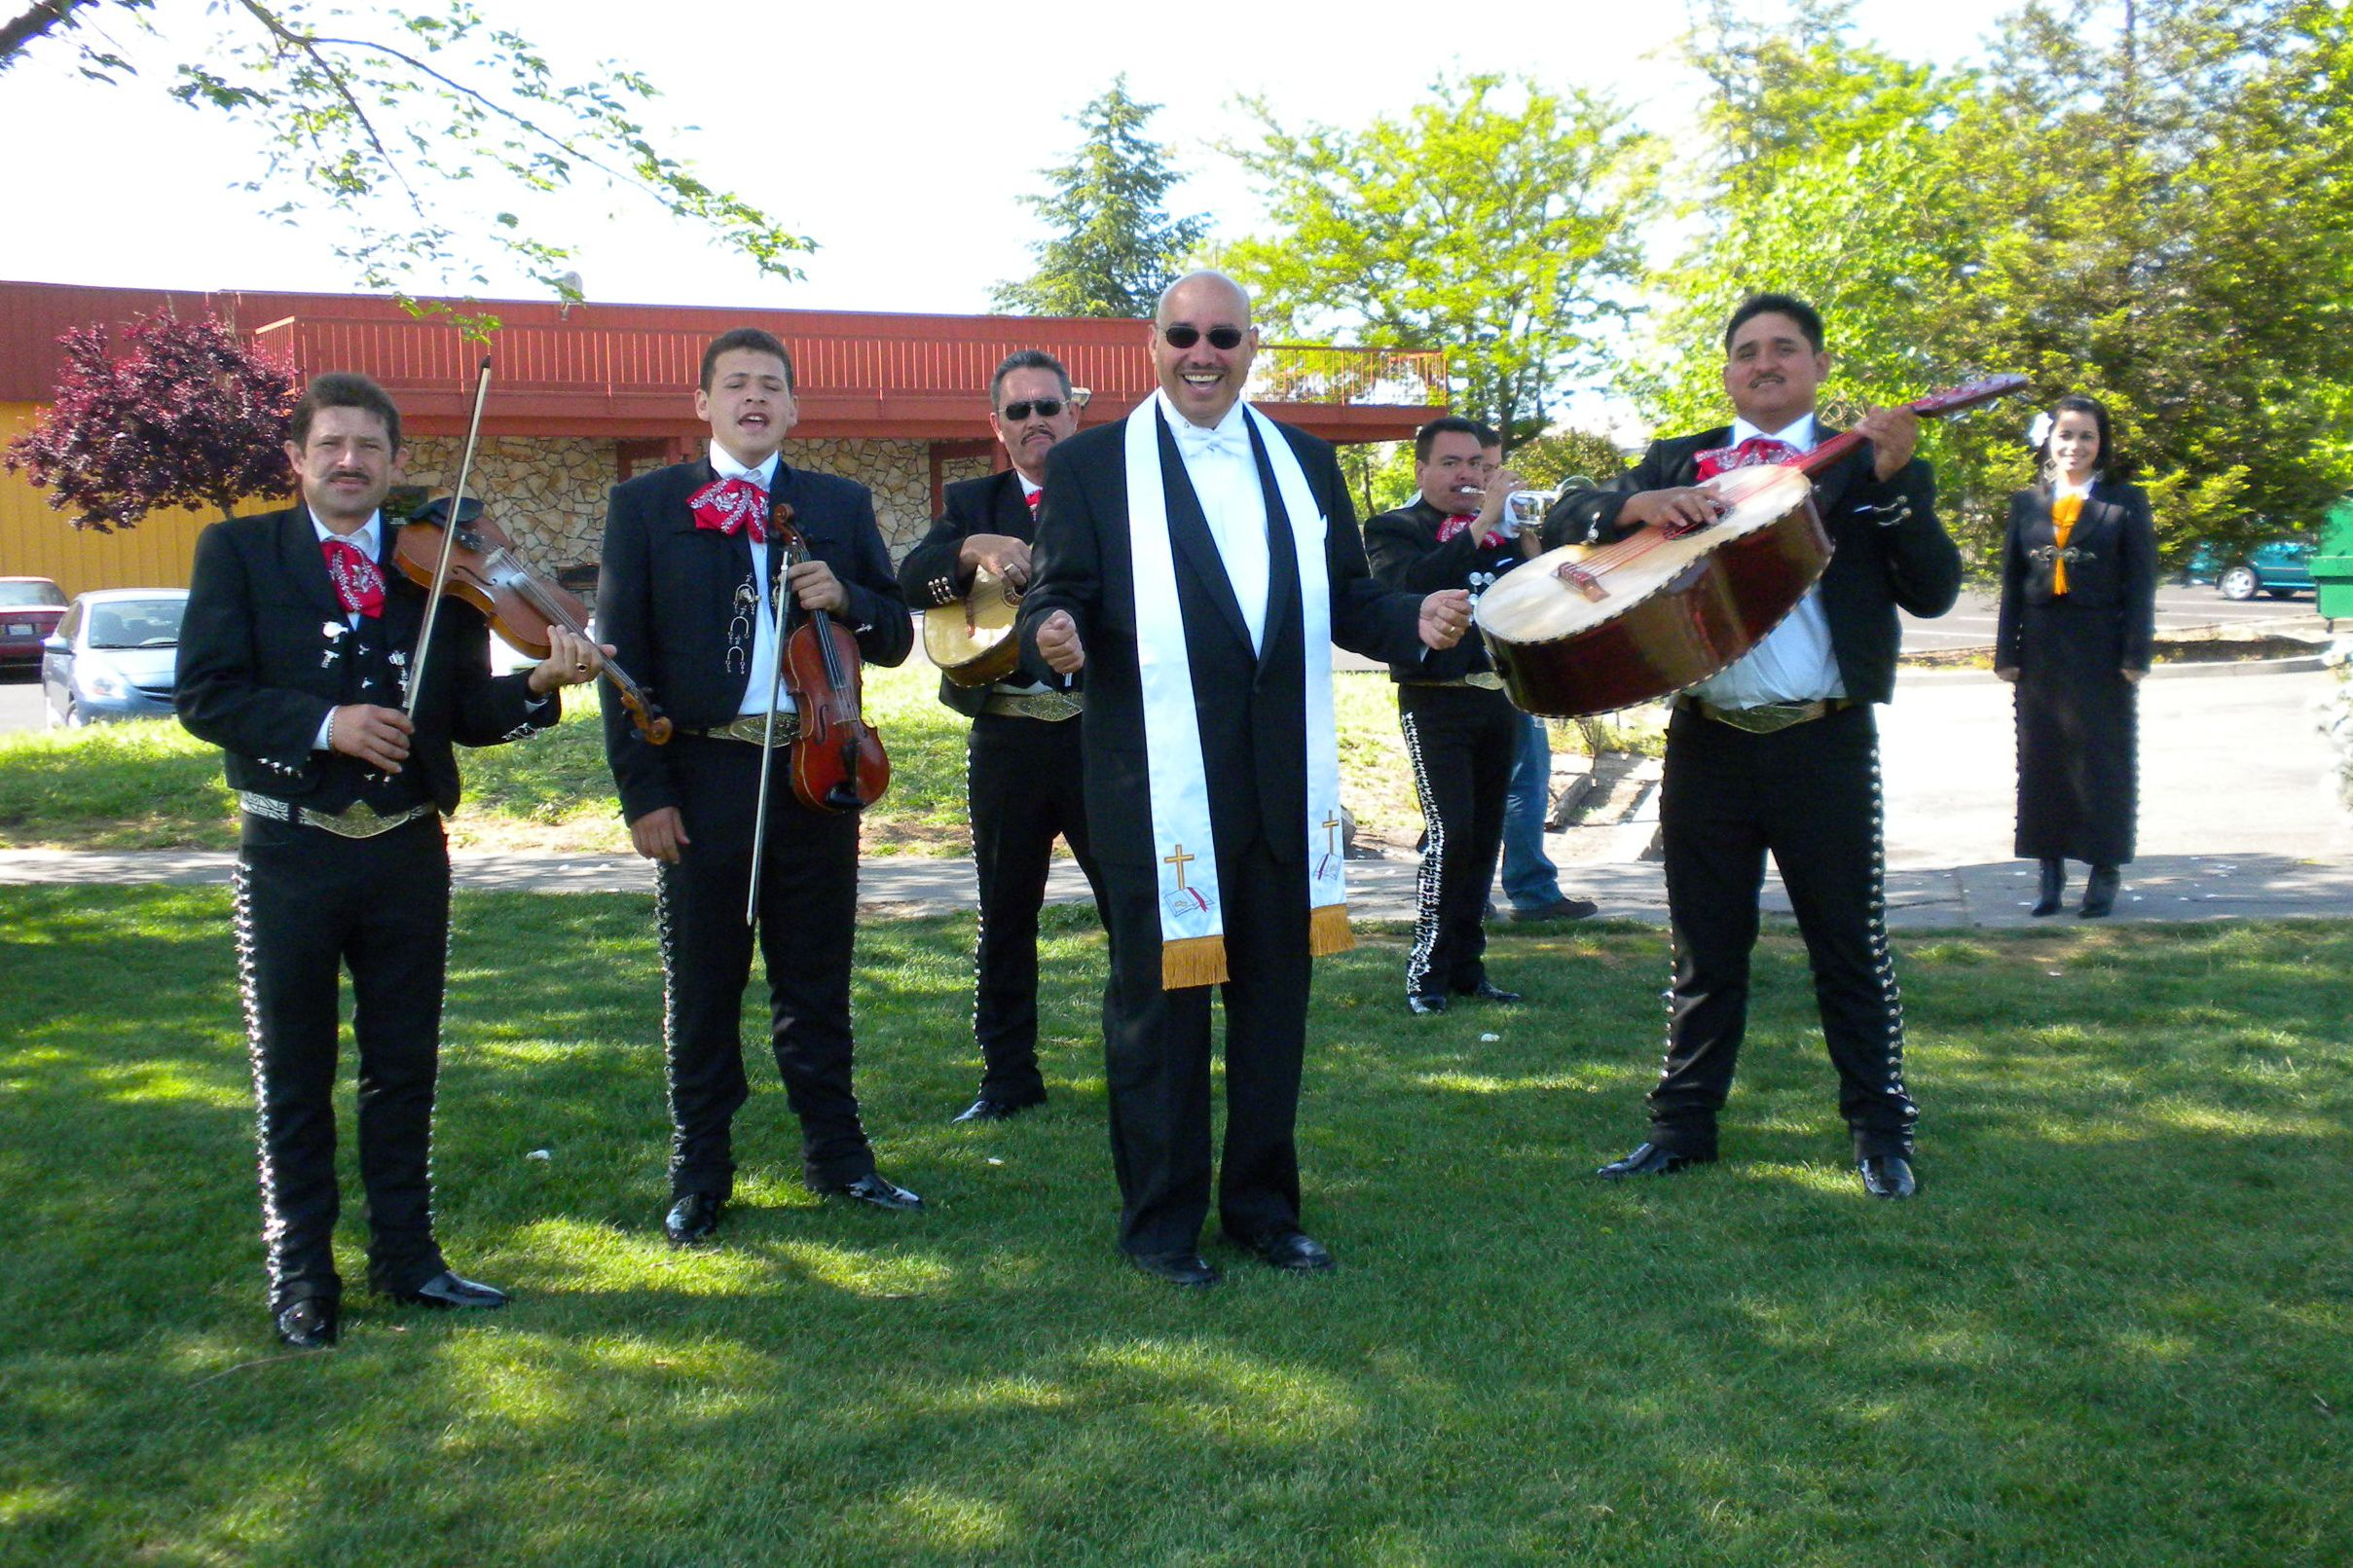 Best bilingual wedding minister in napa www